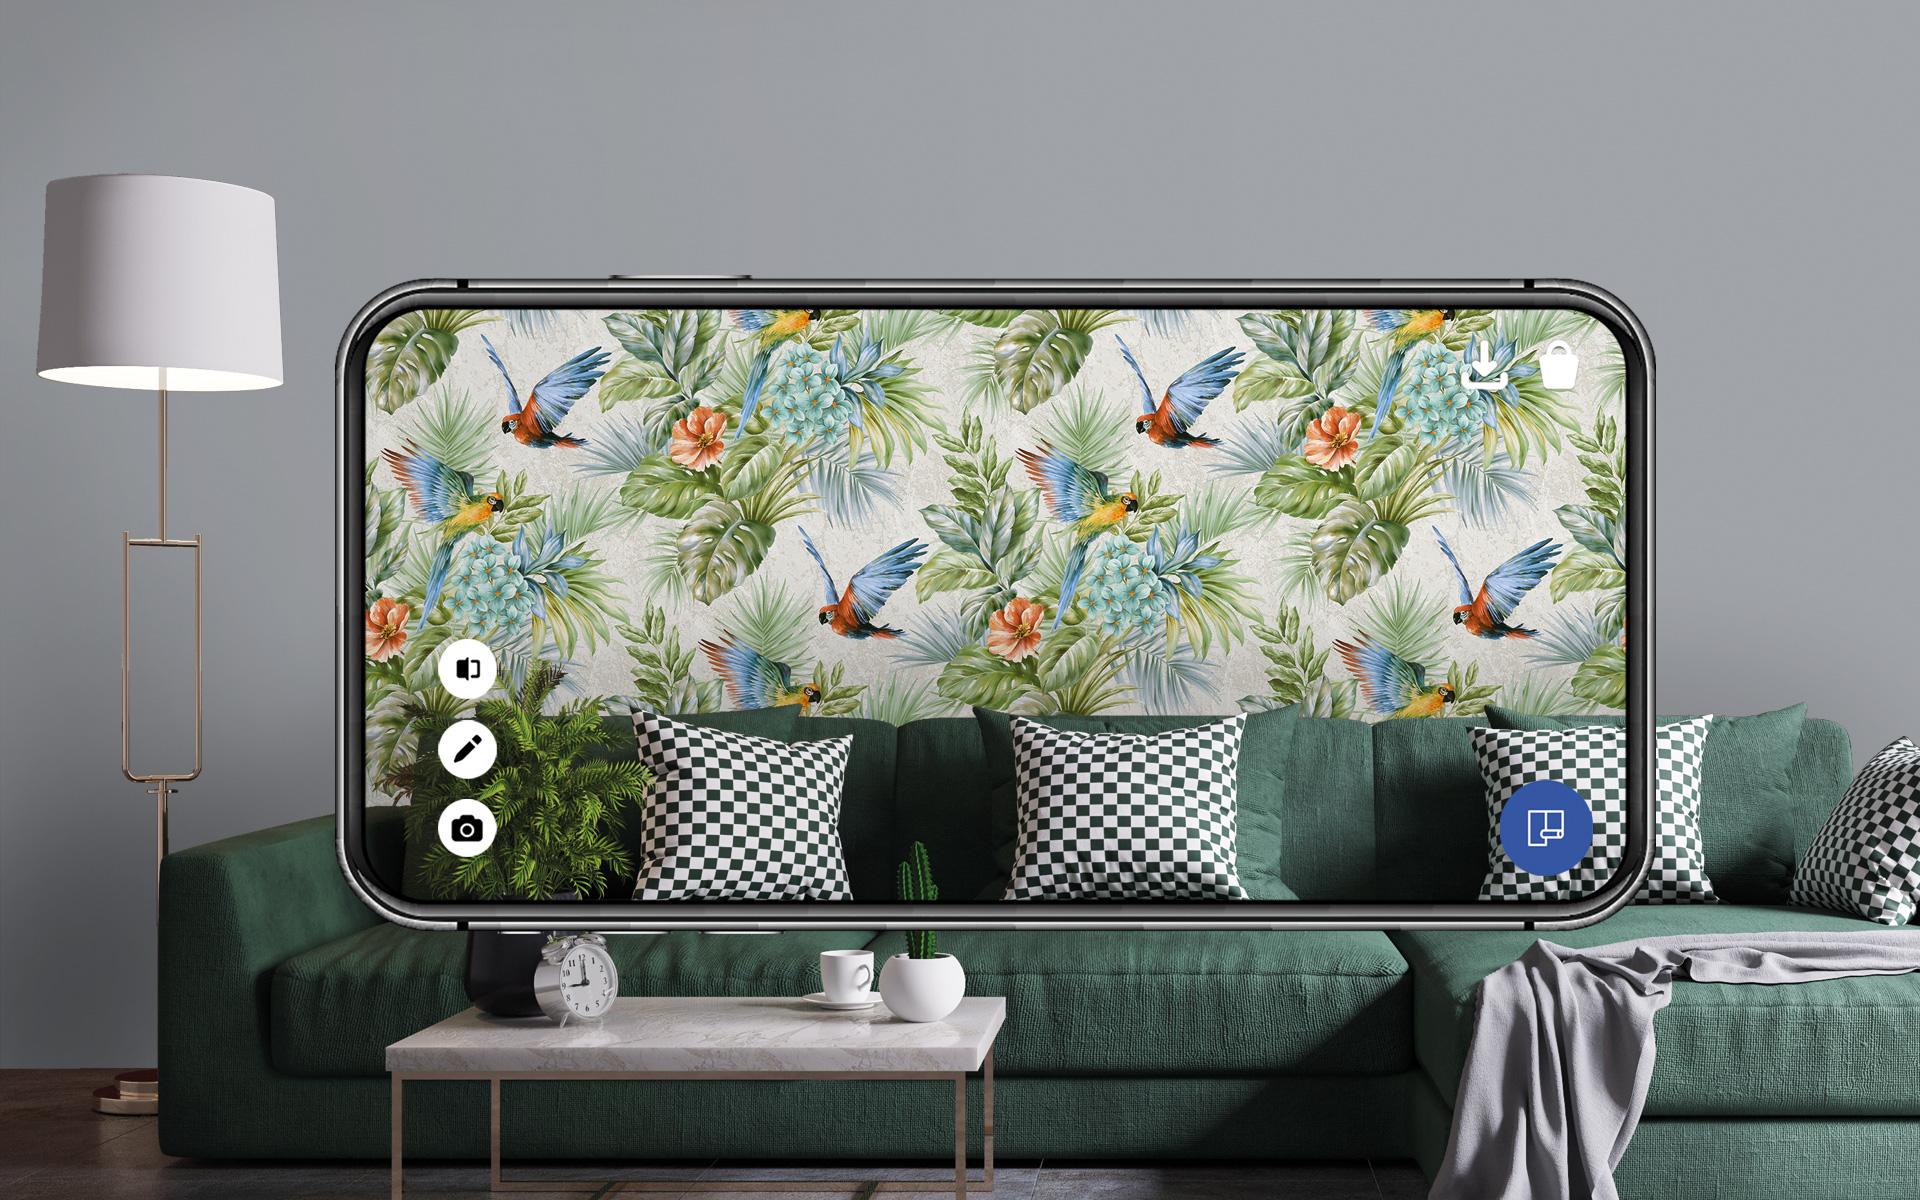 Dgweb4 - Vintage Airplane Wall Art , HD Wallpaper & Backgrounds